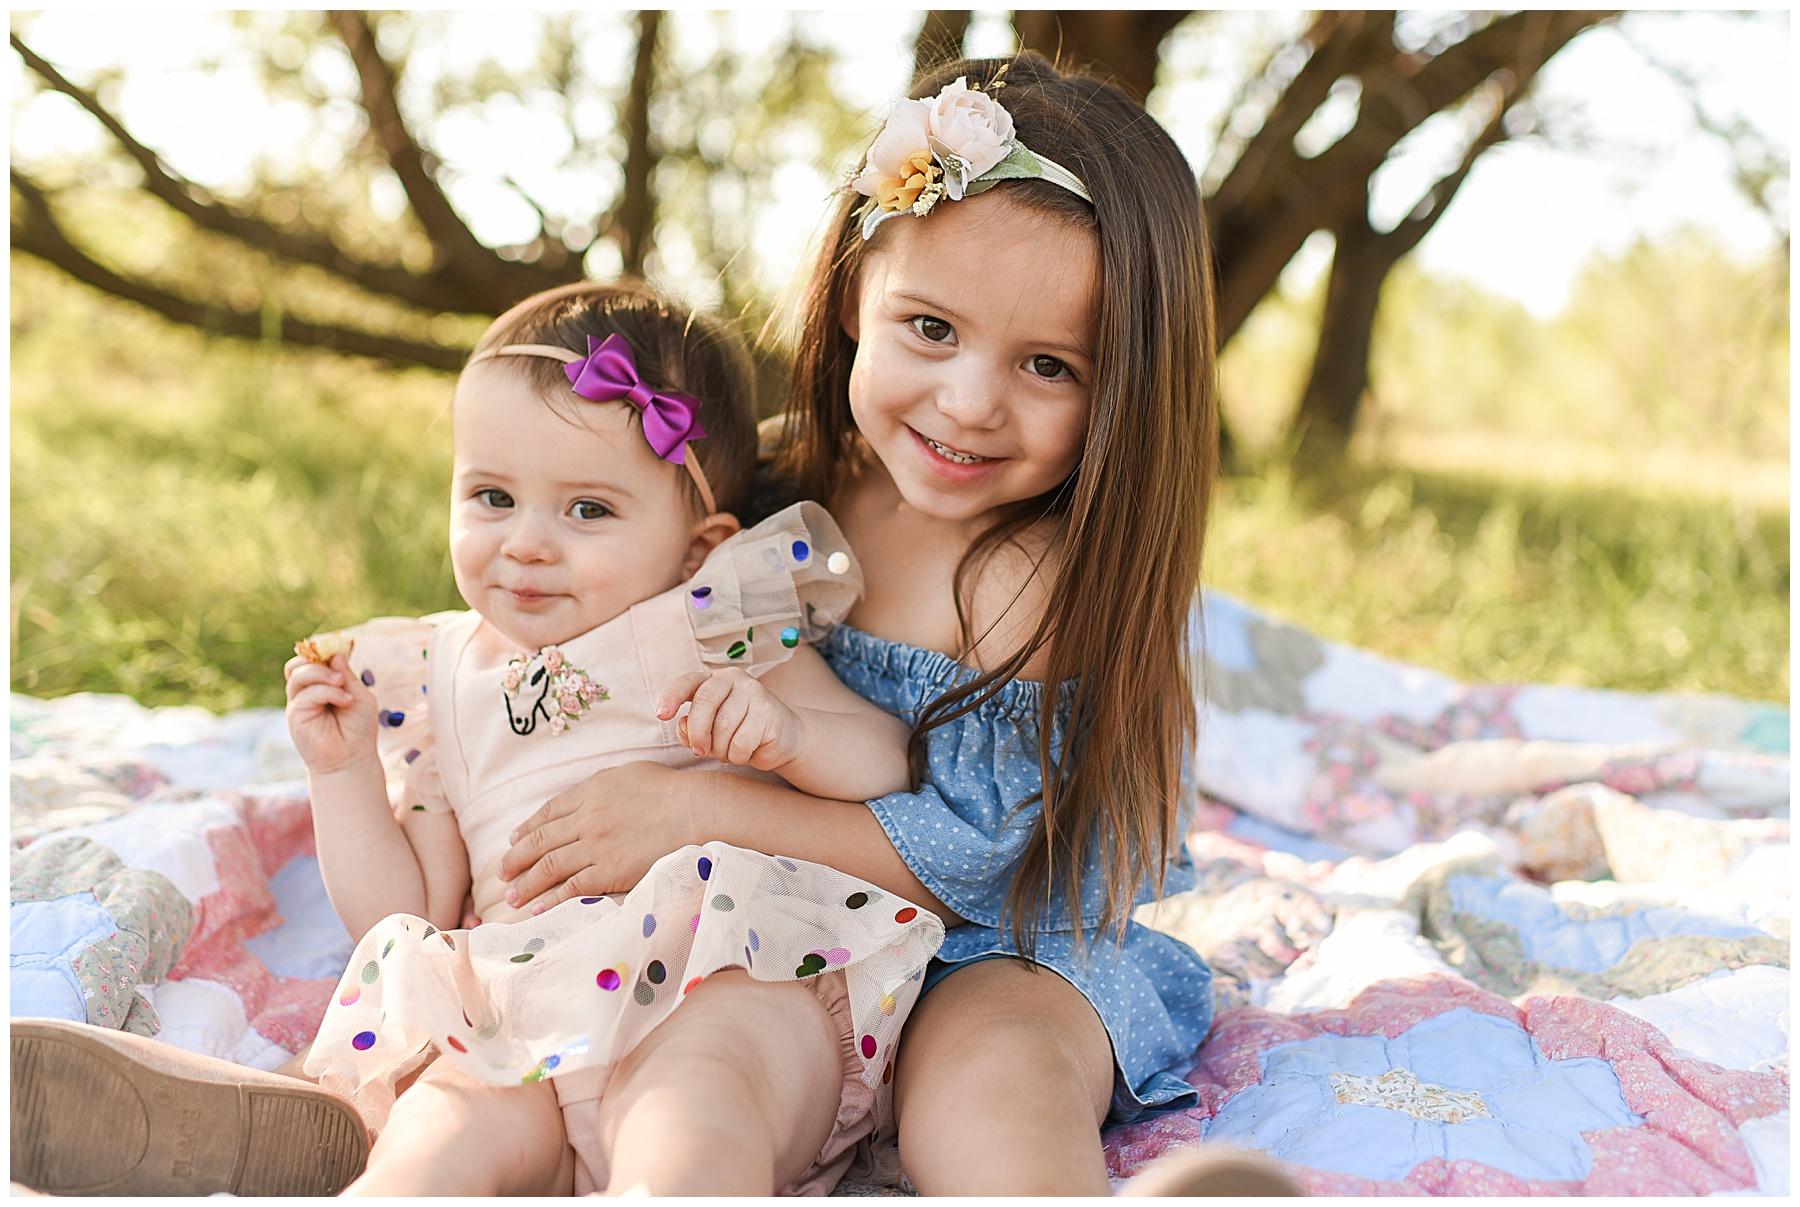 Phoenix Sibling & Child Photographer | SweetLife Photography